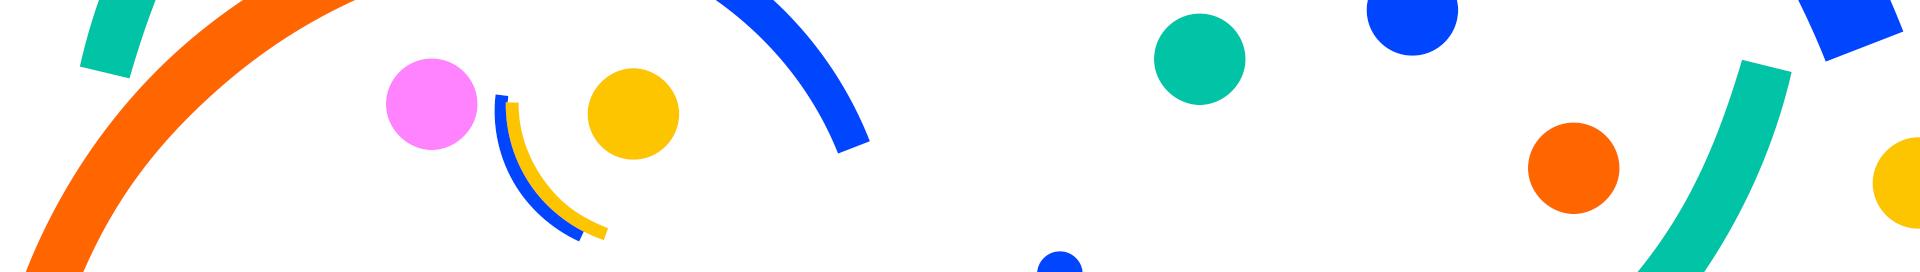 lkj-headerbild5